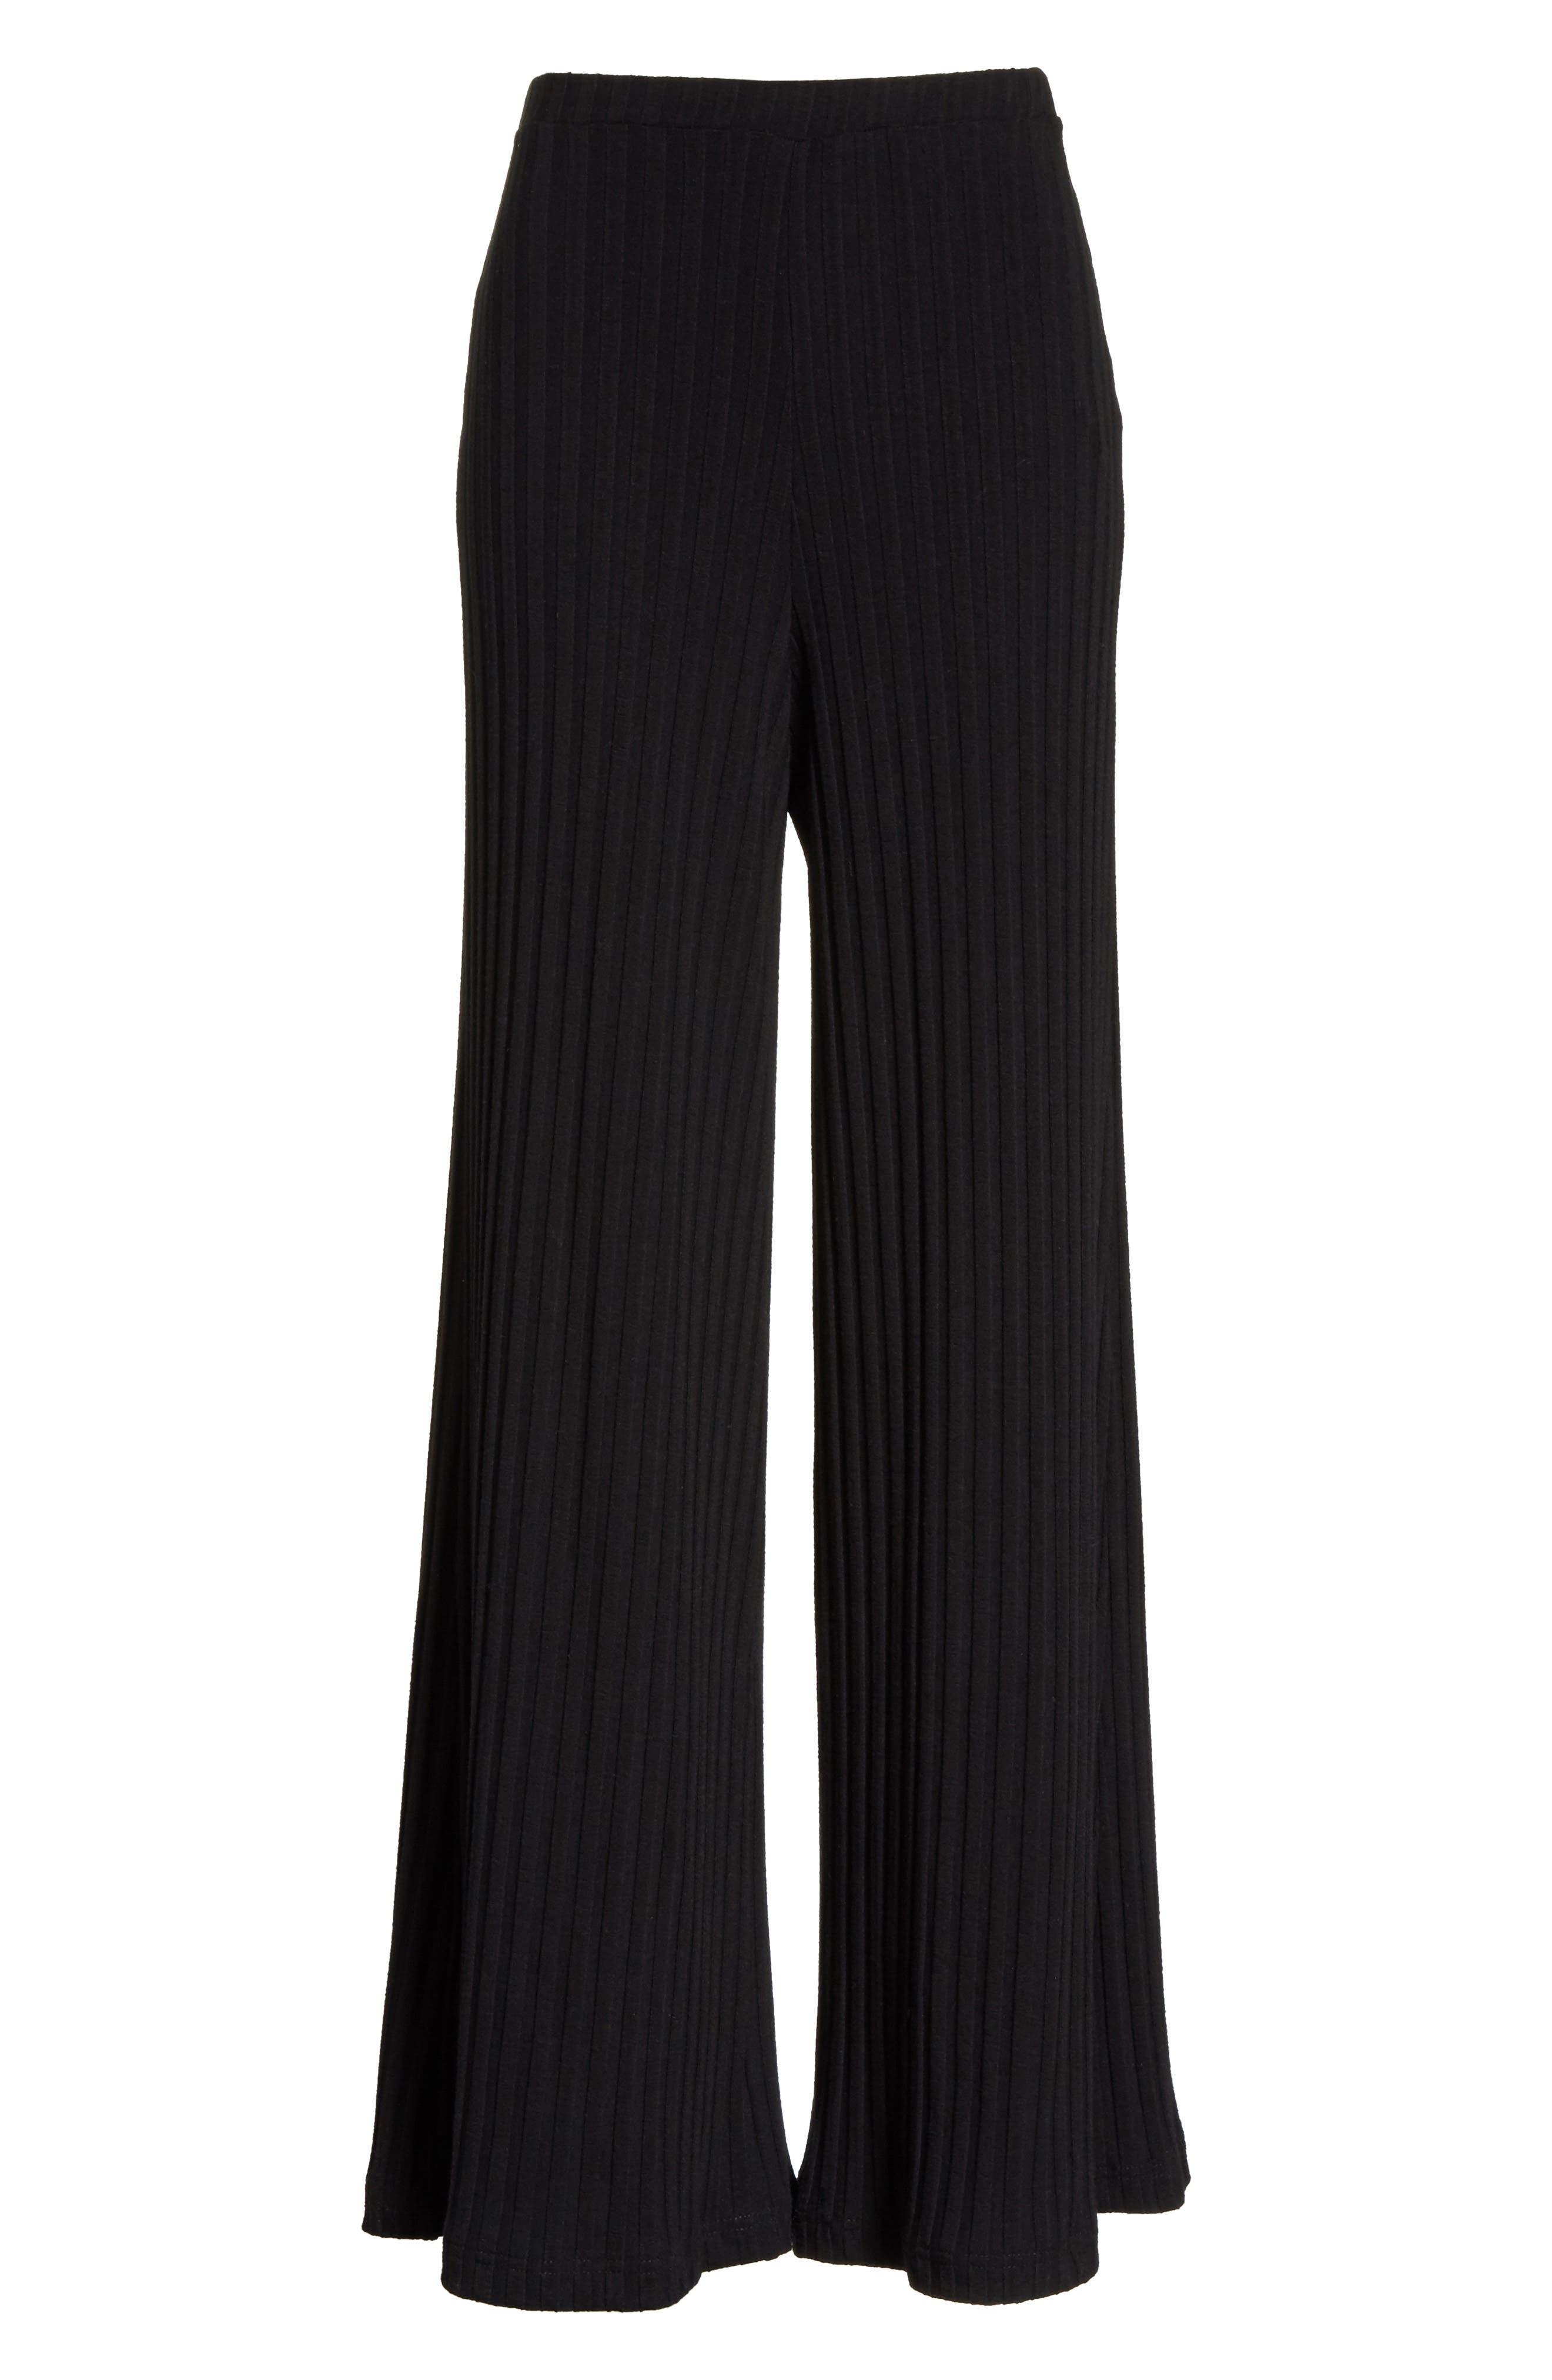 Rian Ribbed Bell Bottom Pants,                             Alternate thumbnail 6, color,                             Black